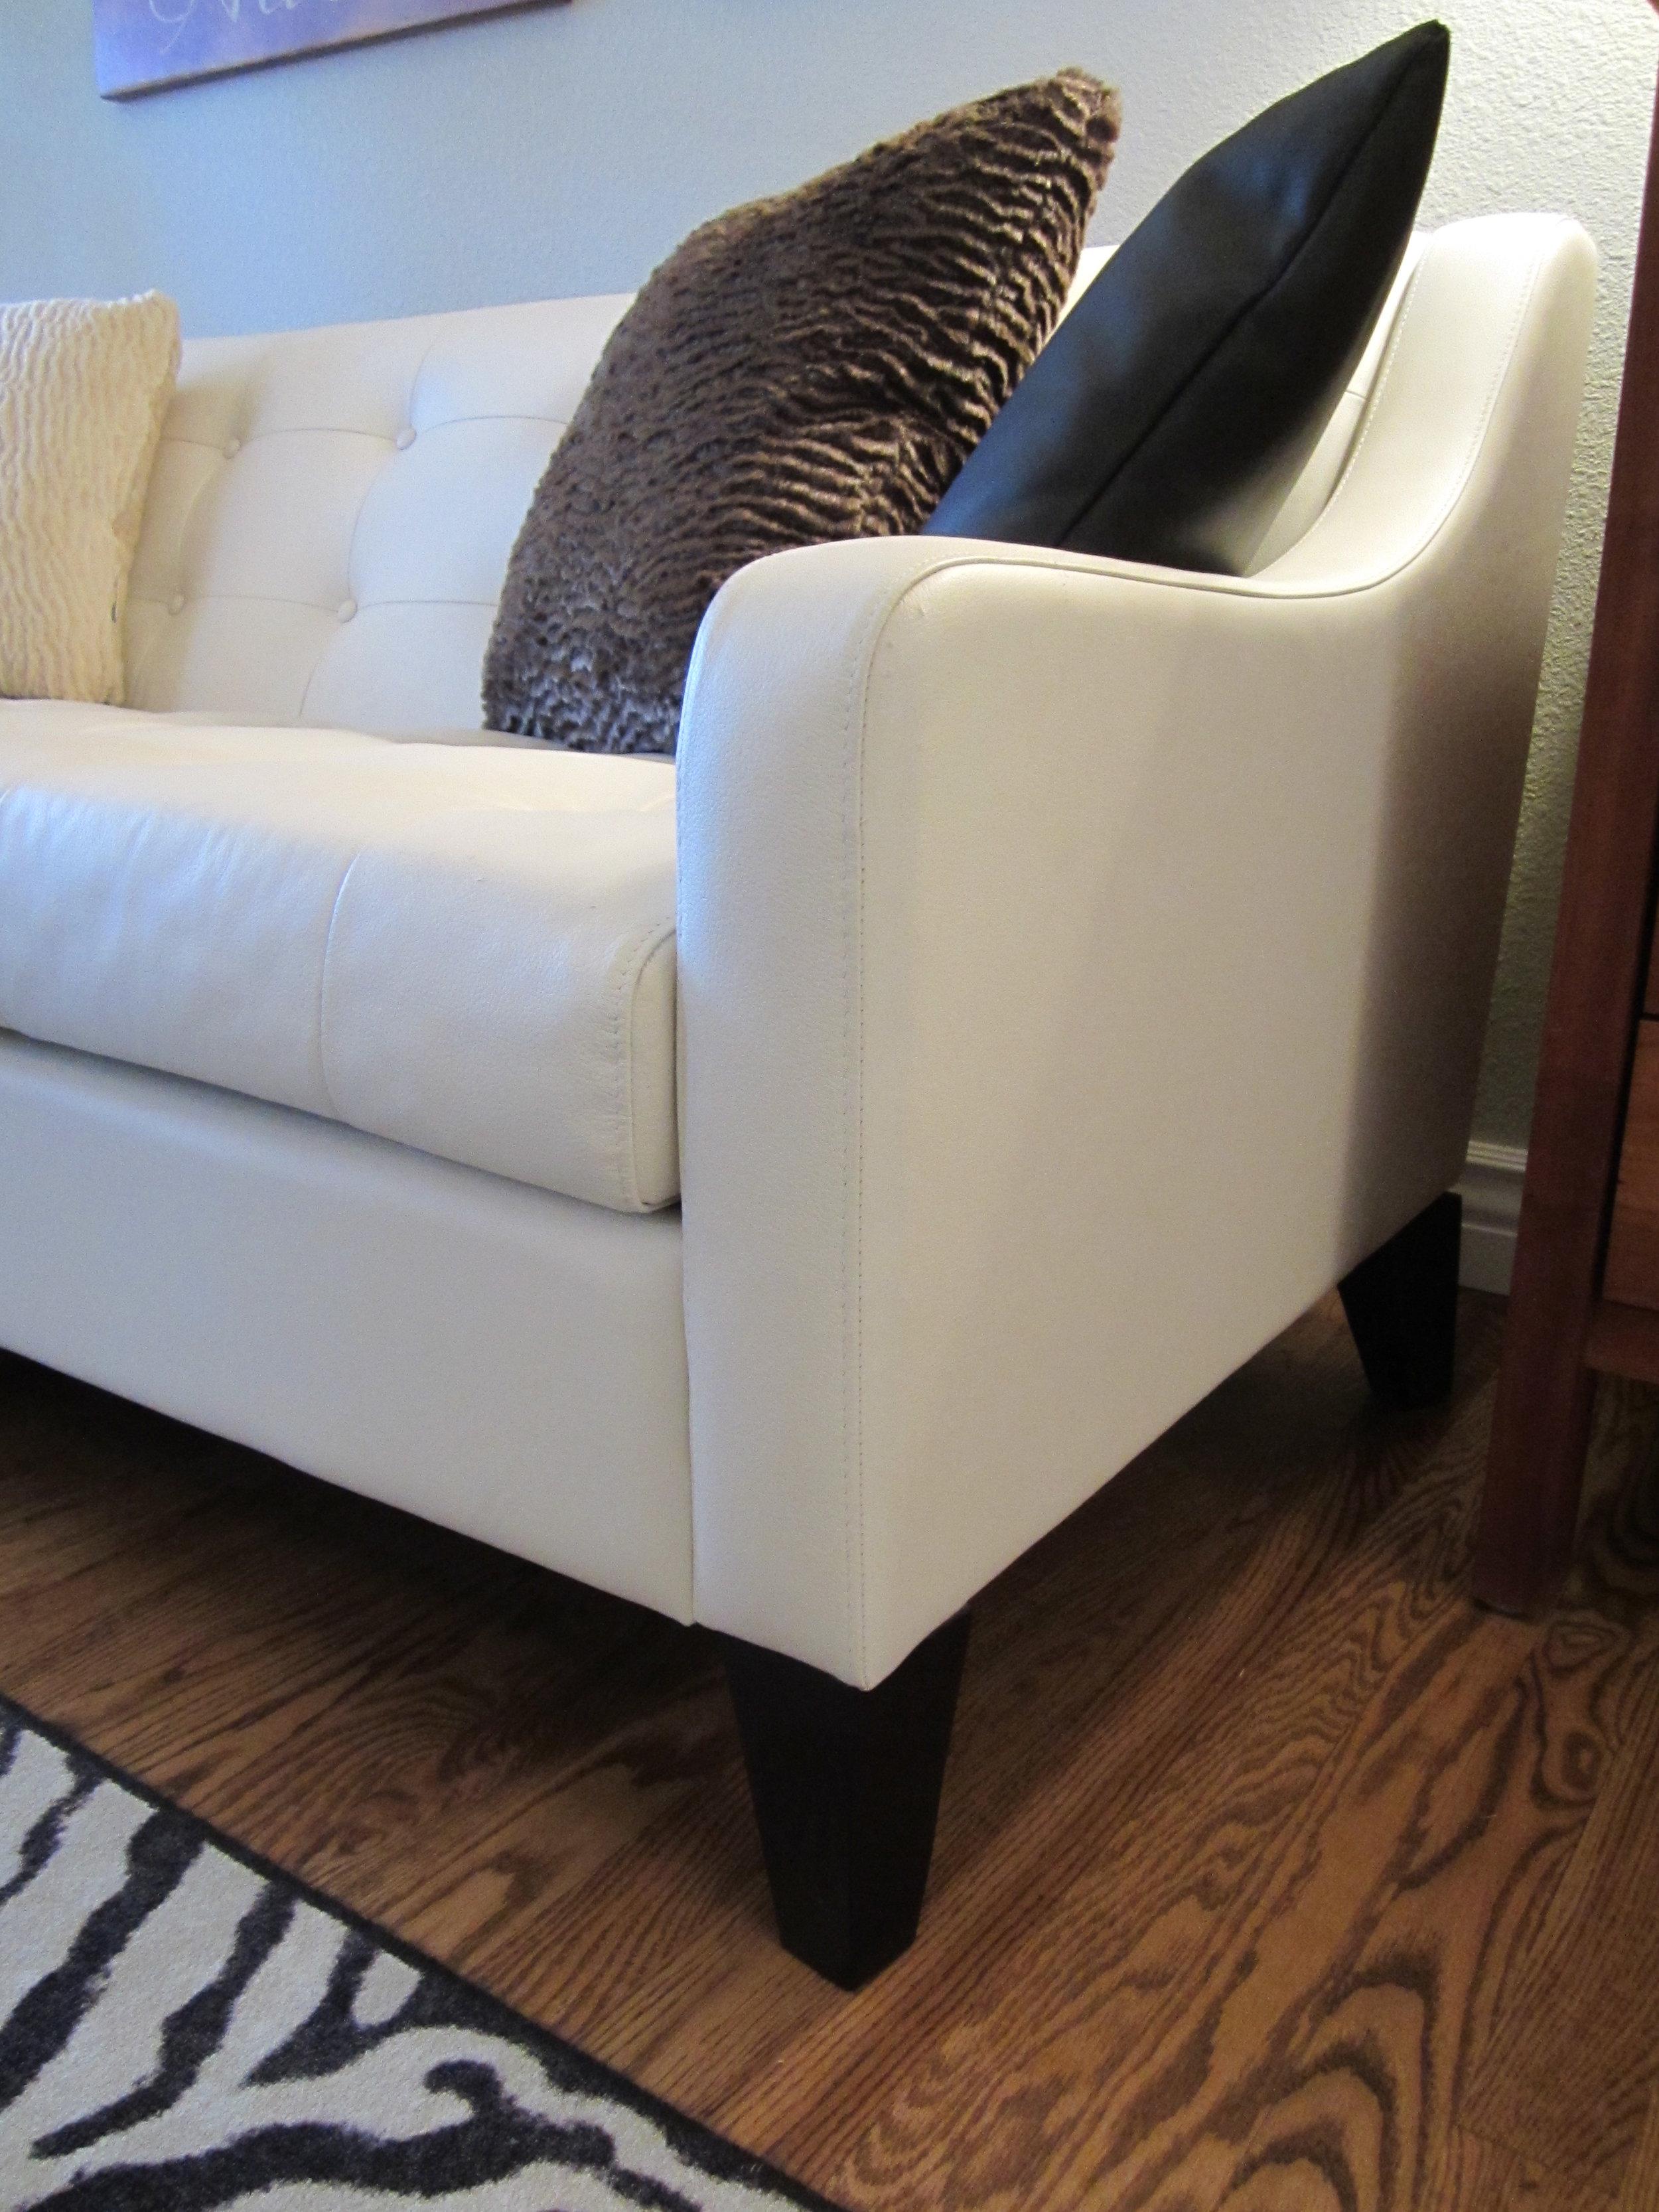 Furniture & Layout